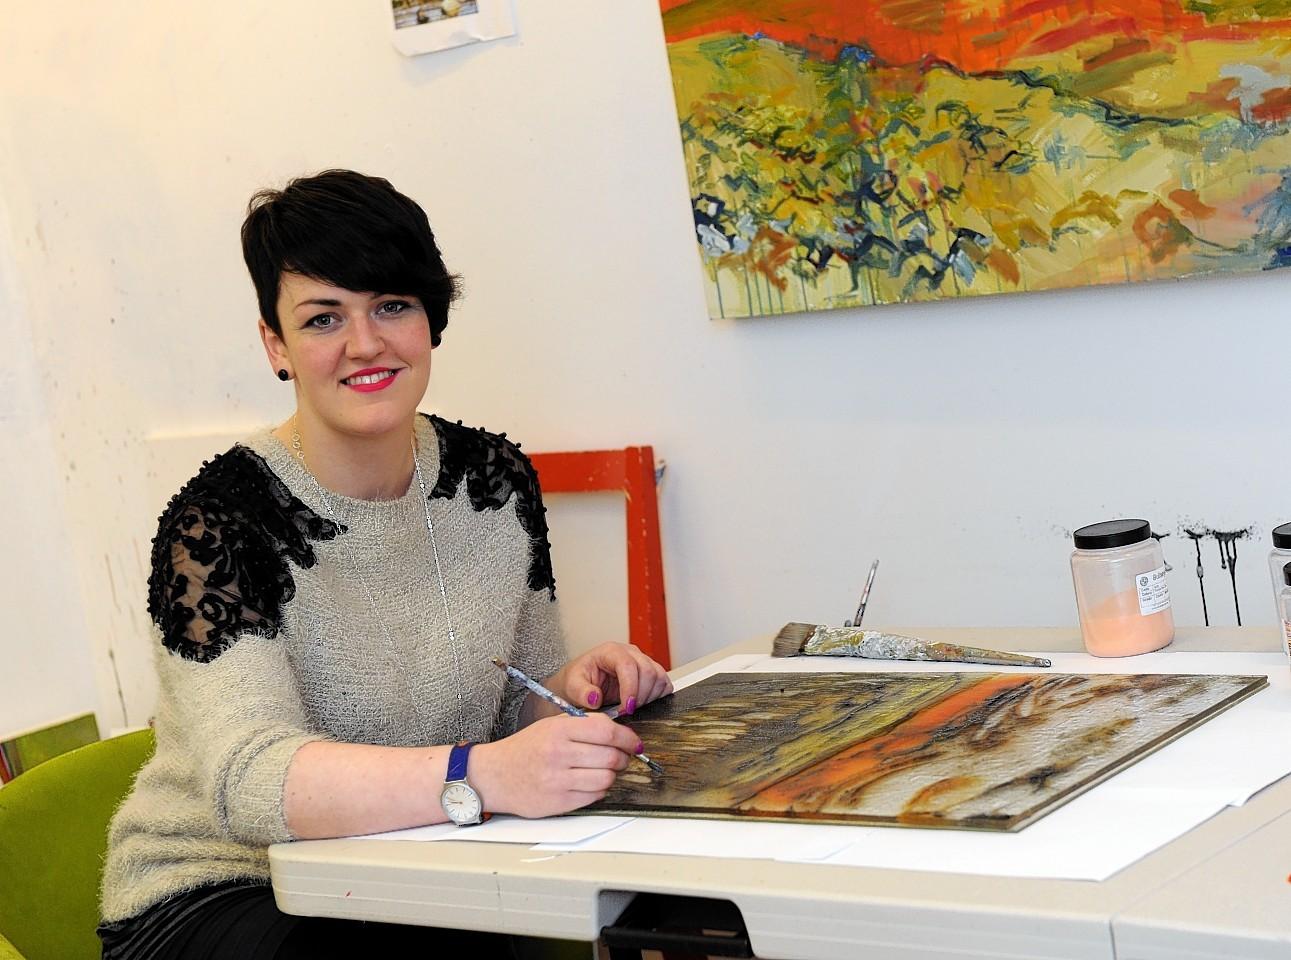 Shelagh Swanson will be showcasing her work